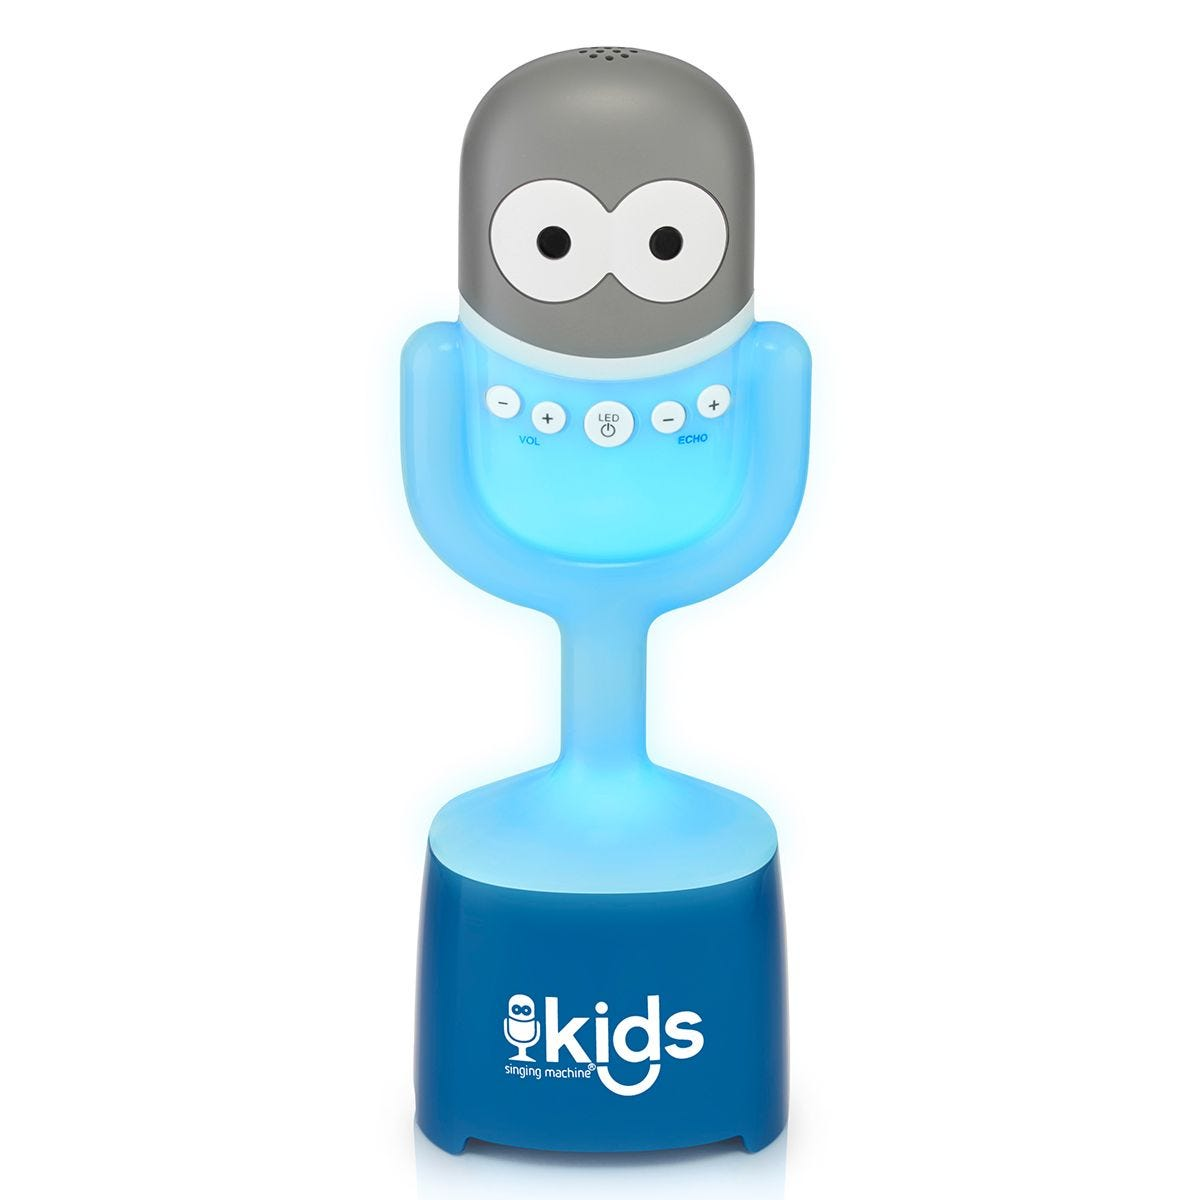 Singing Machine SMK445 Kids Bluetooth Speaker and Microphone for Karaoke